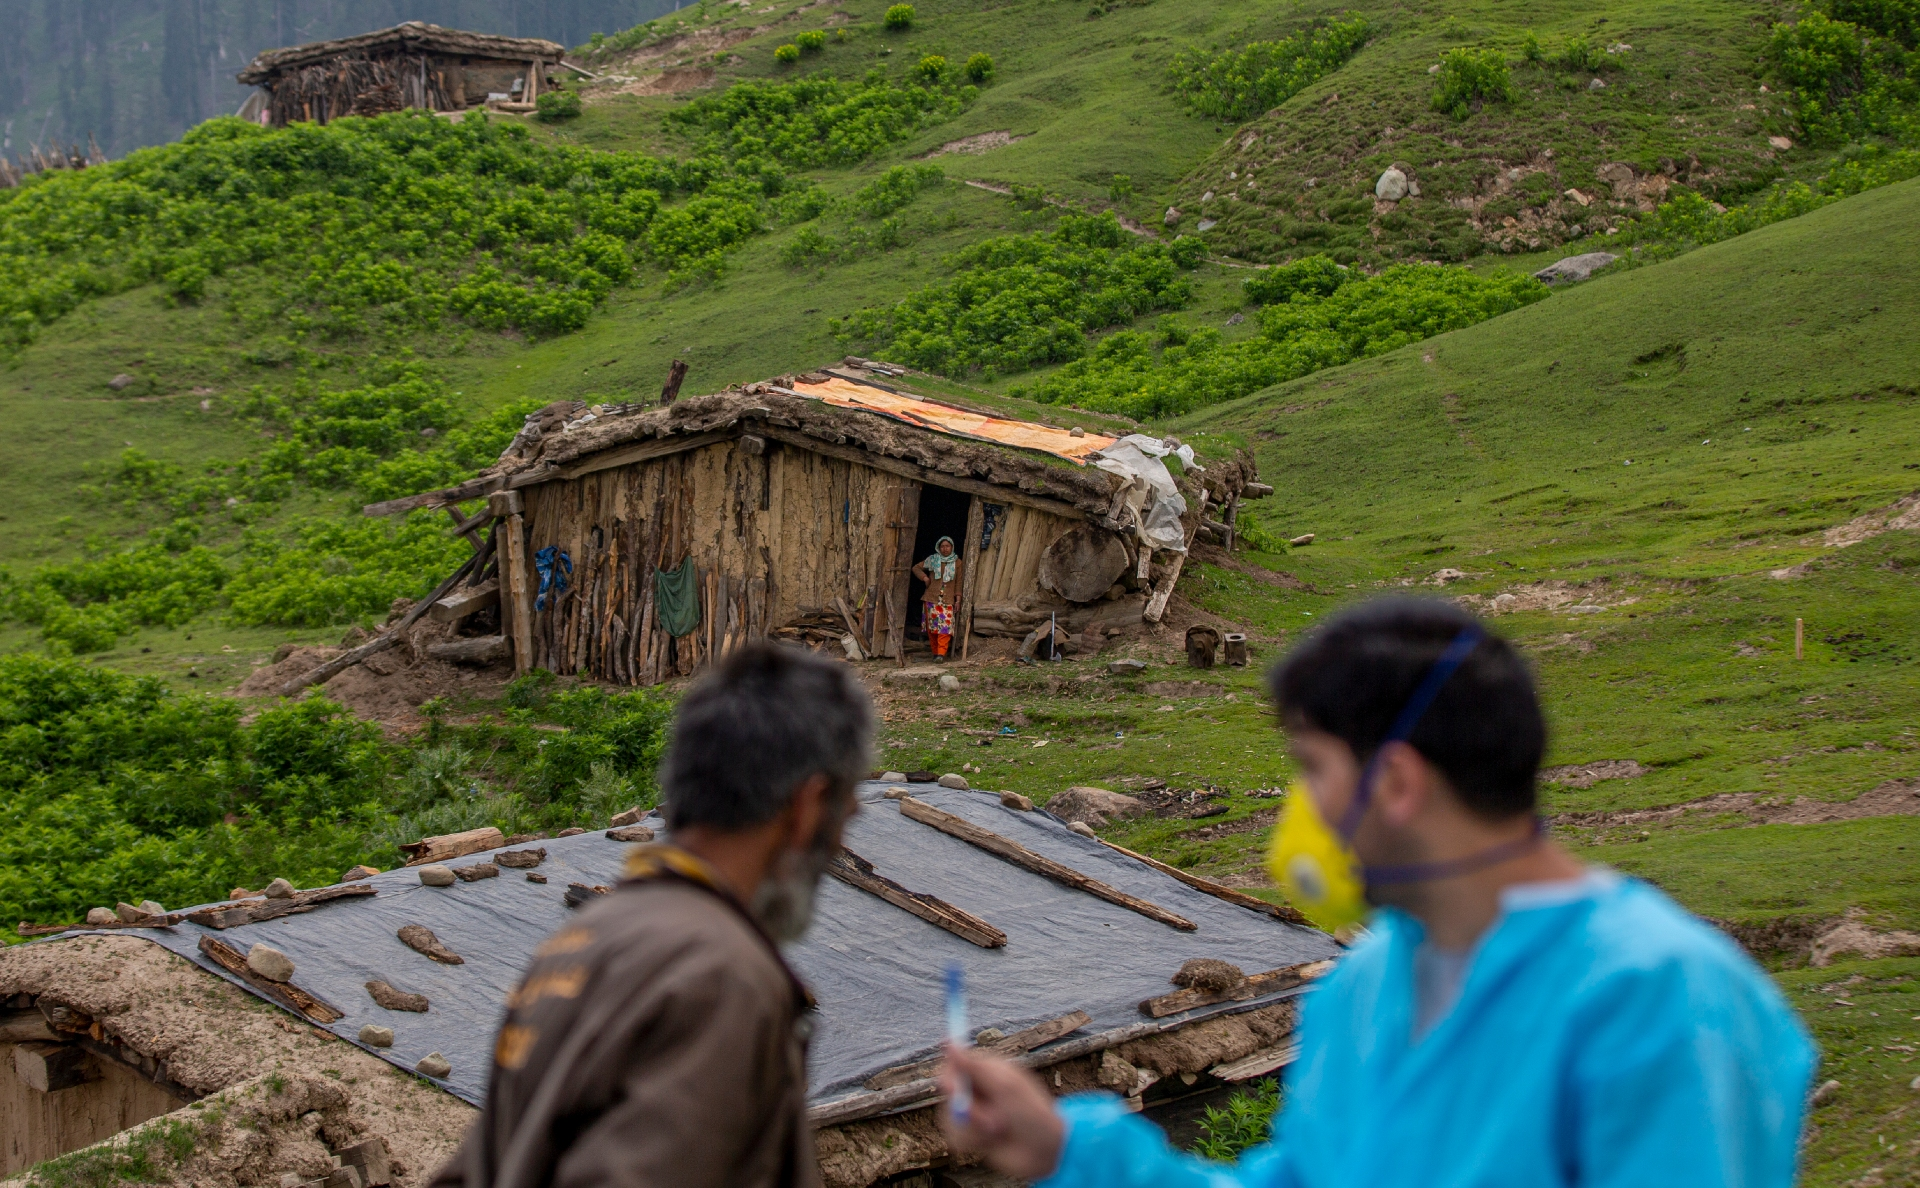 Фото:Dar Yasin / AP